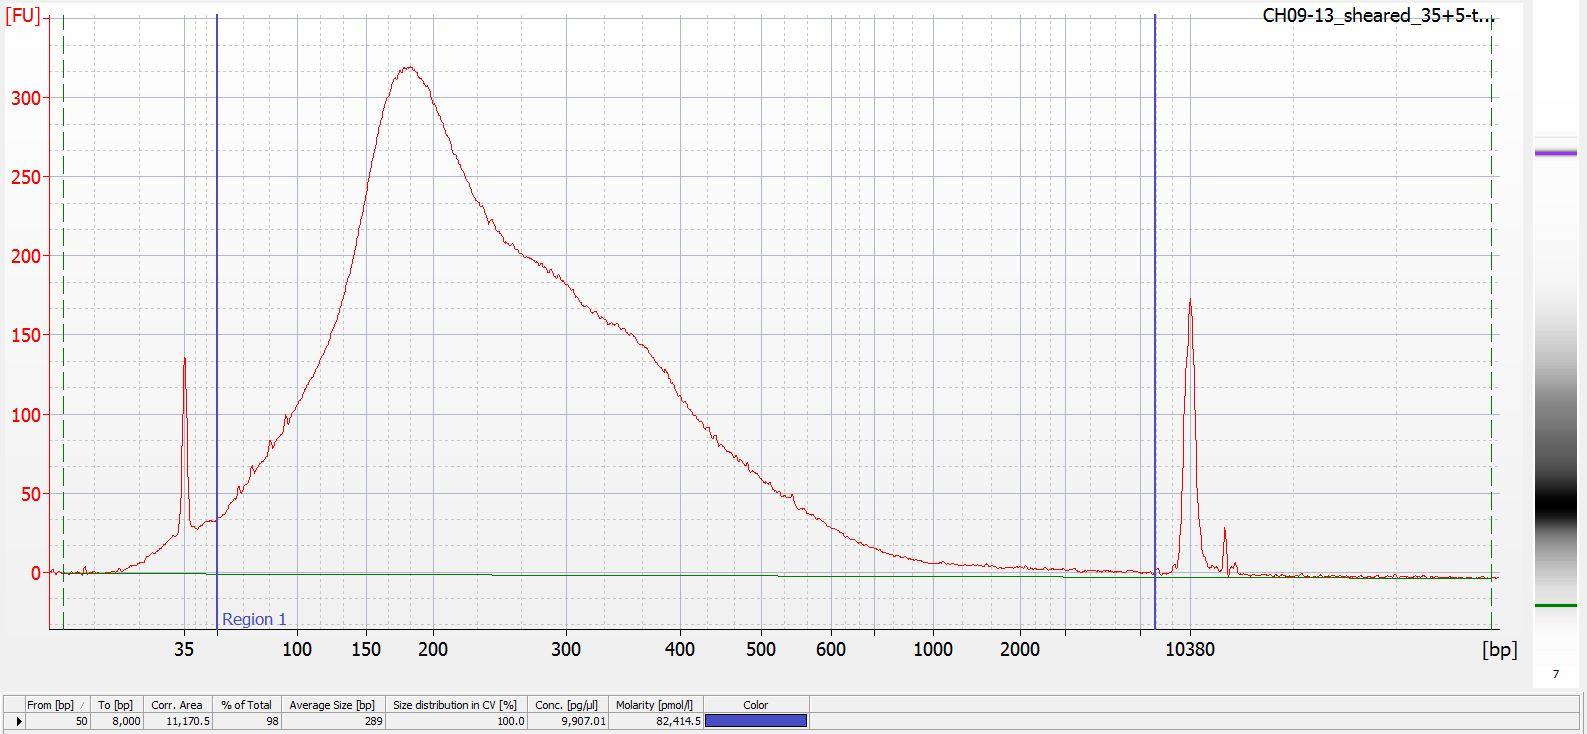 Sheared CH09-13 Bioanalyzer electropherogram